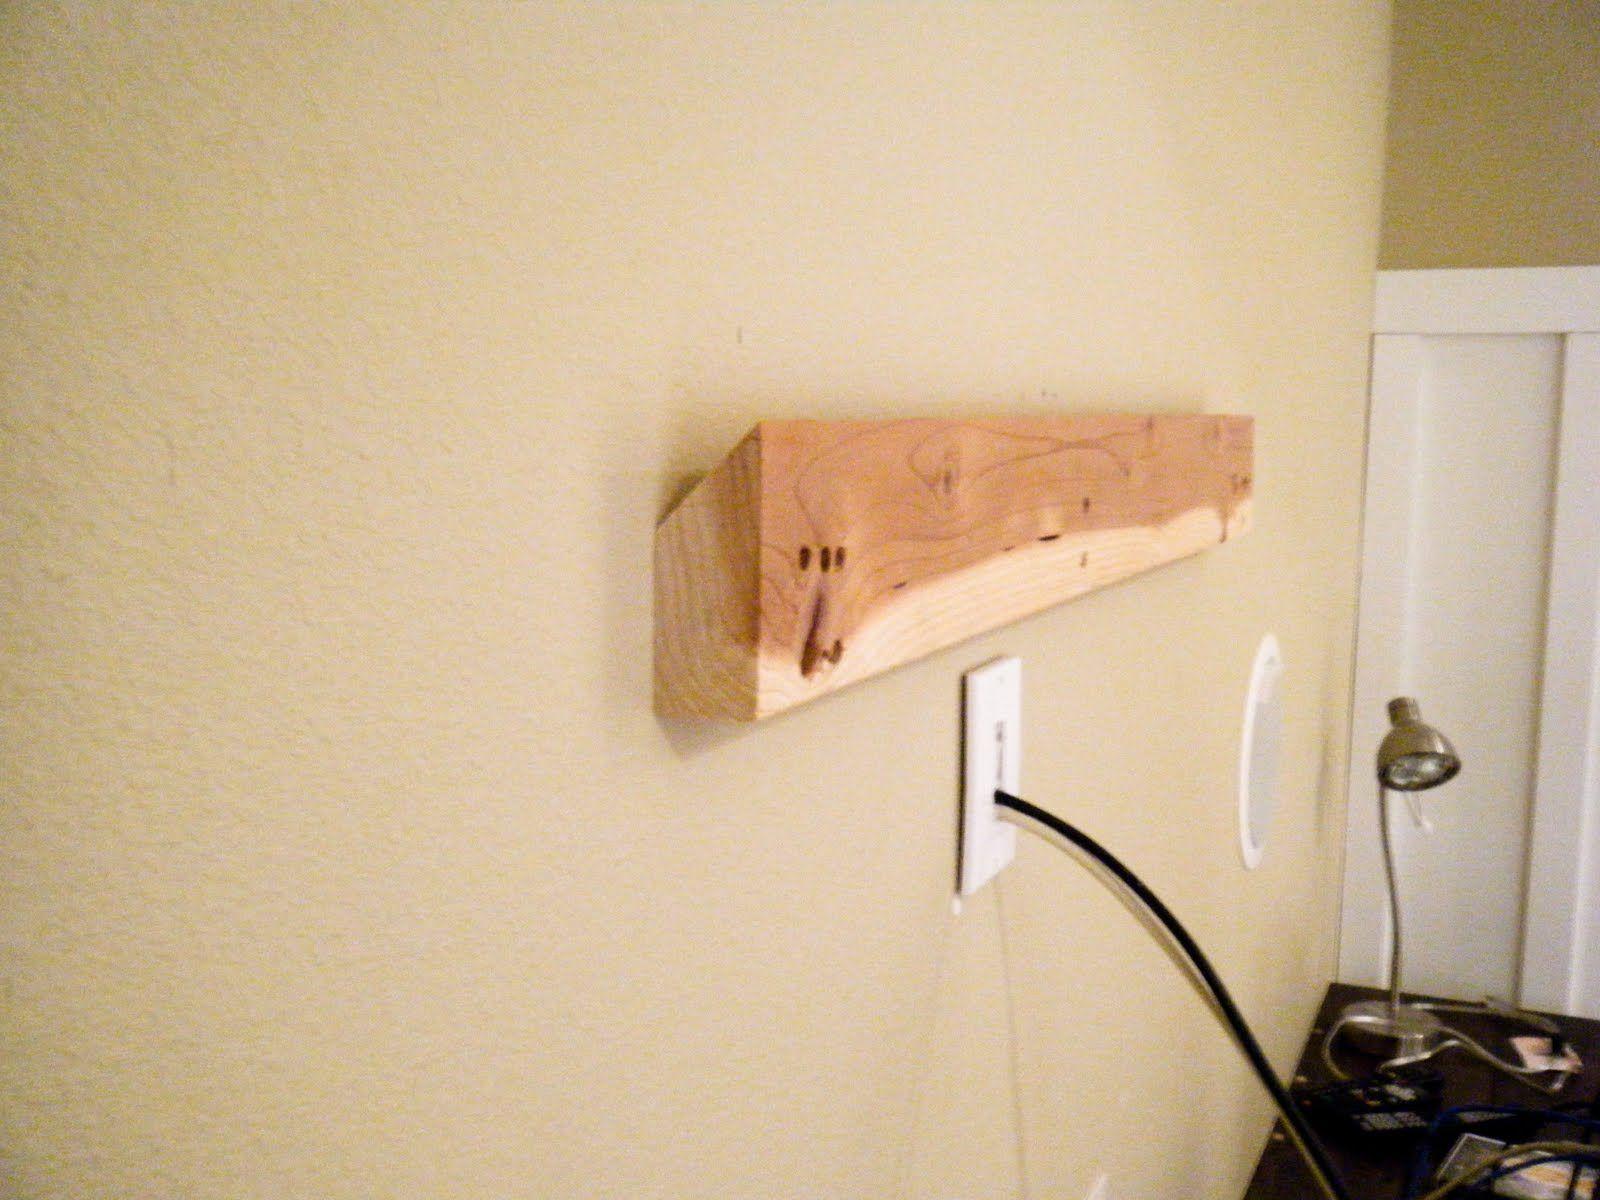 Budget Friendly Way To Hang Flat Screen Tv Hang Flat Screen Tv Home Wall Decor French Cleat